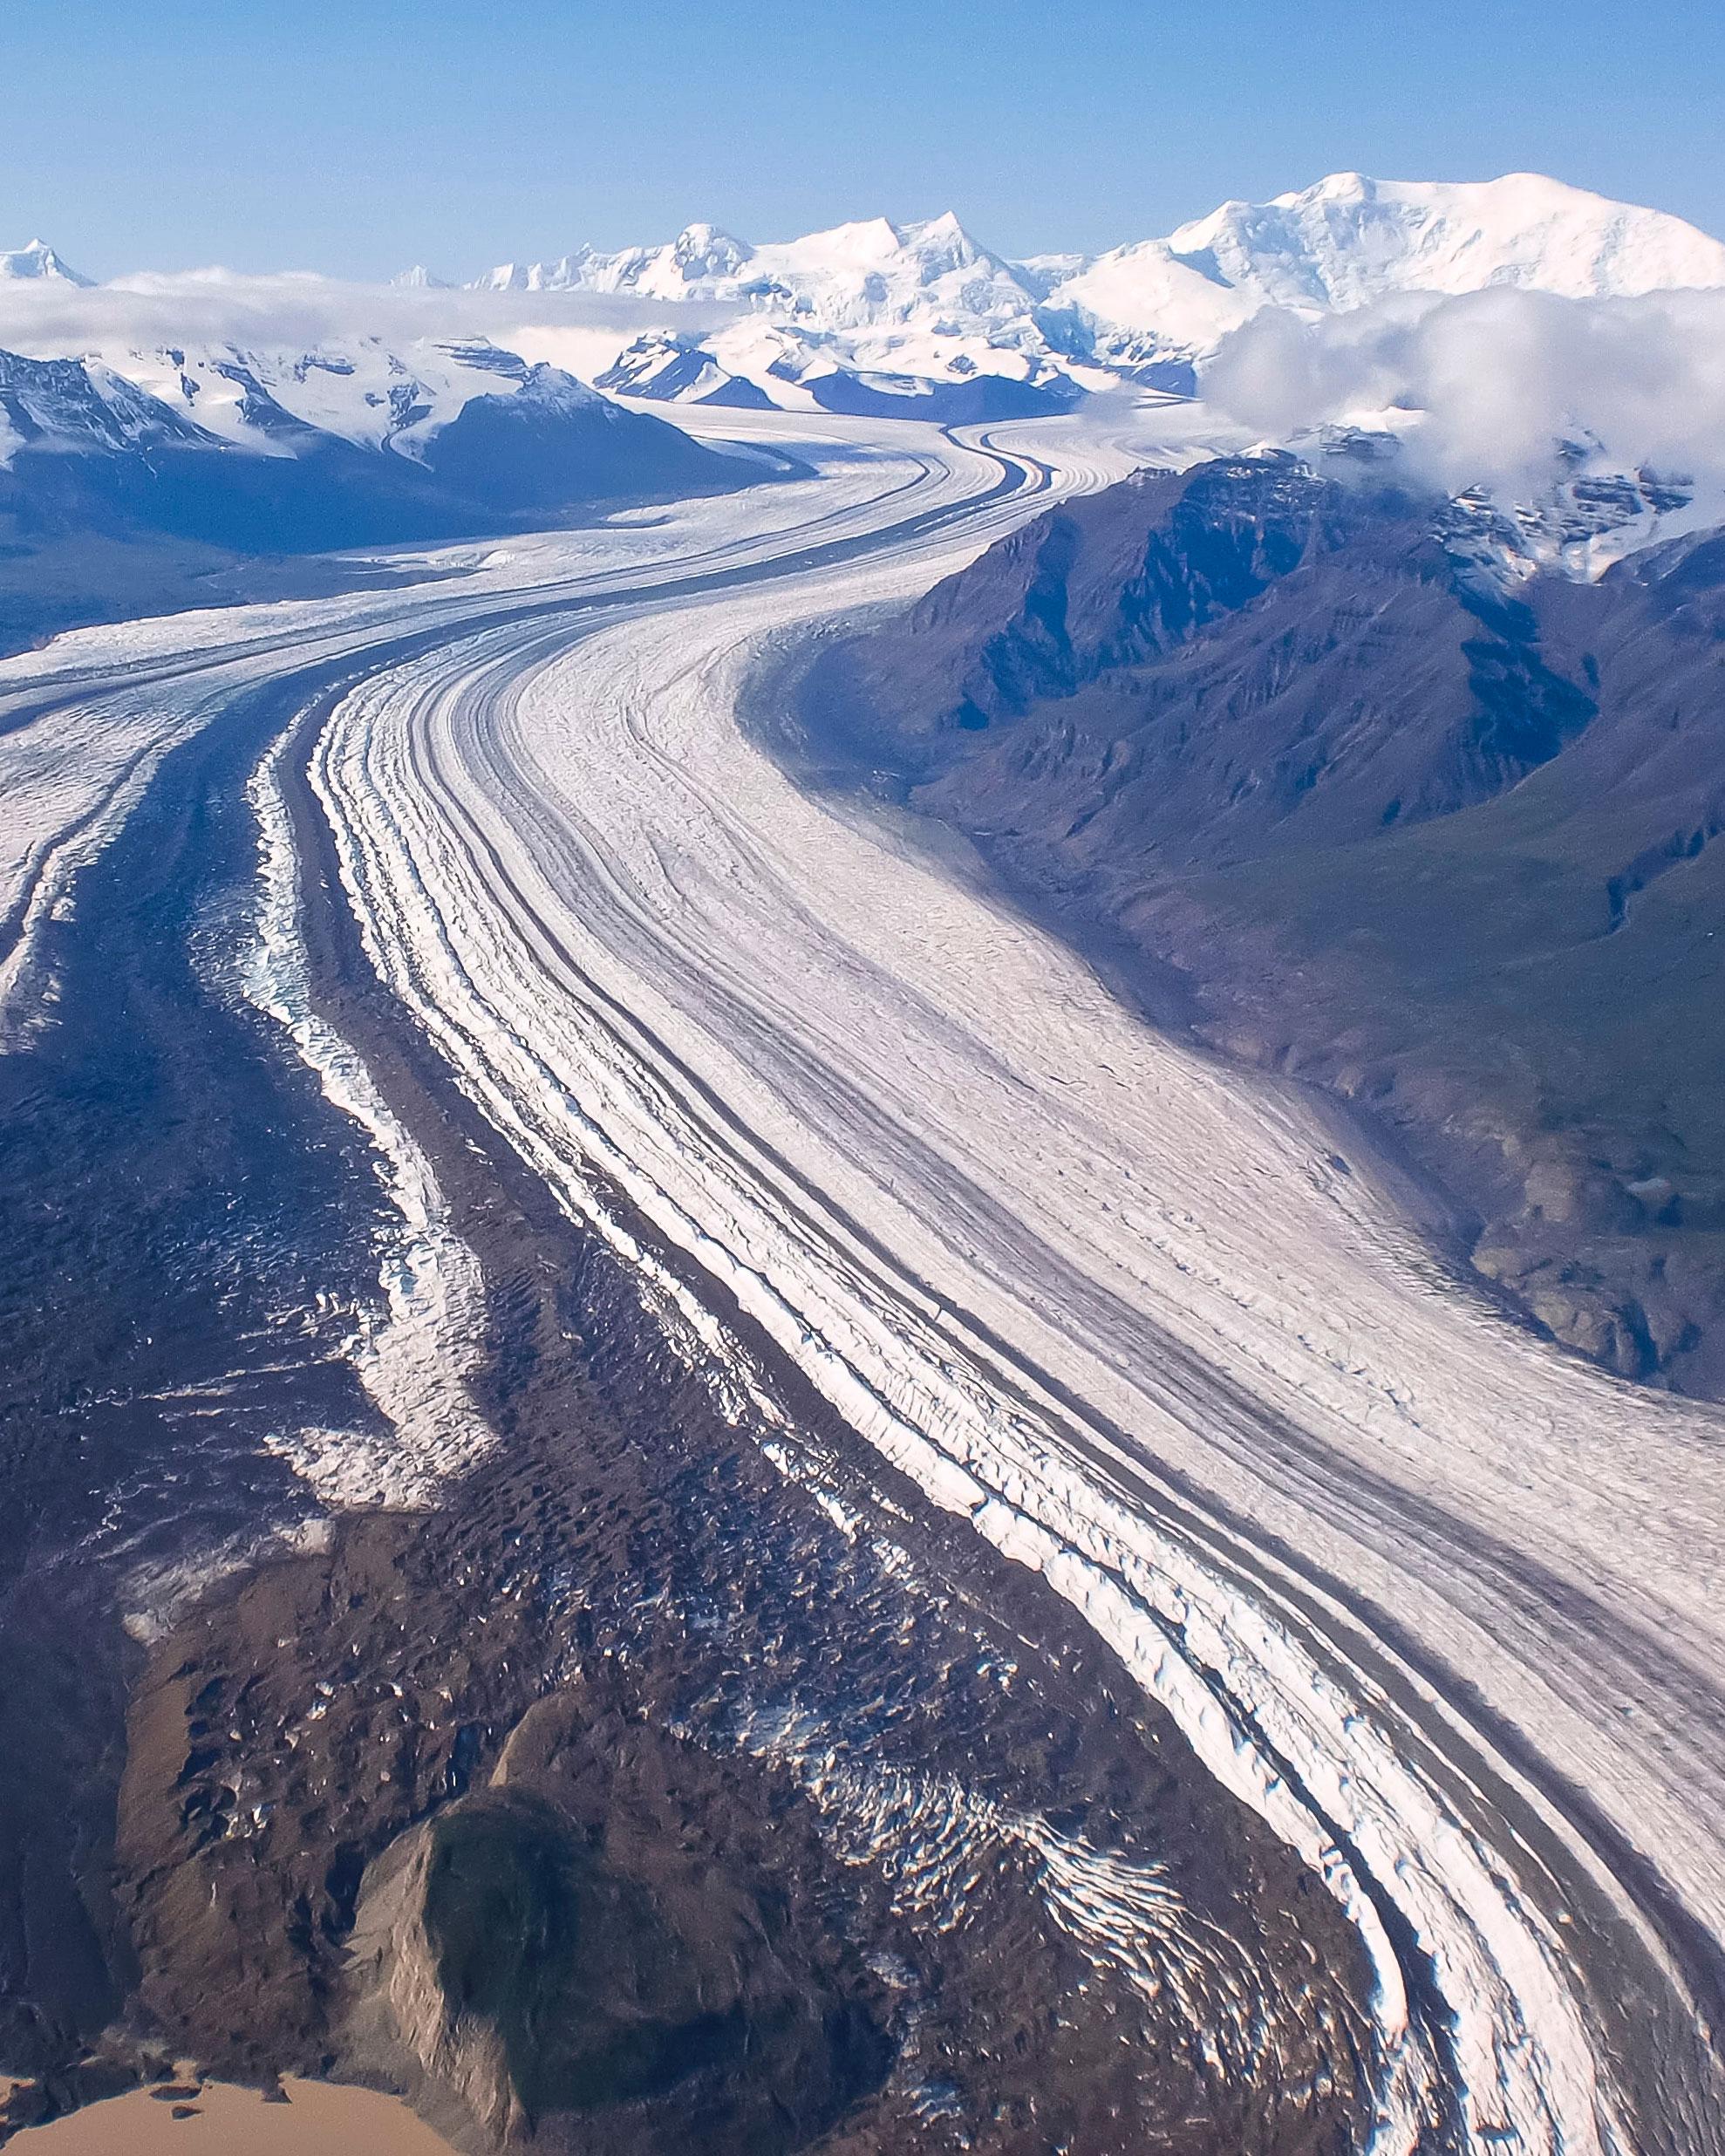 Nps Geodiversity Atlas Wrangell St Elias National Park Alaska U S National Park Service